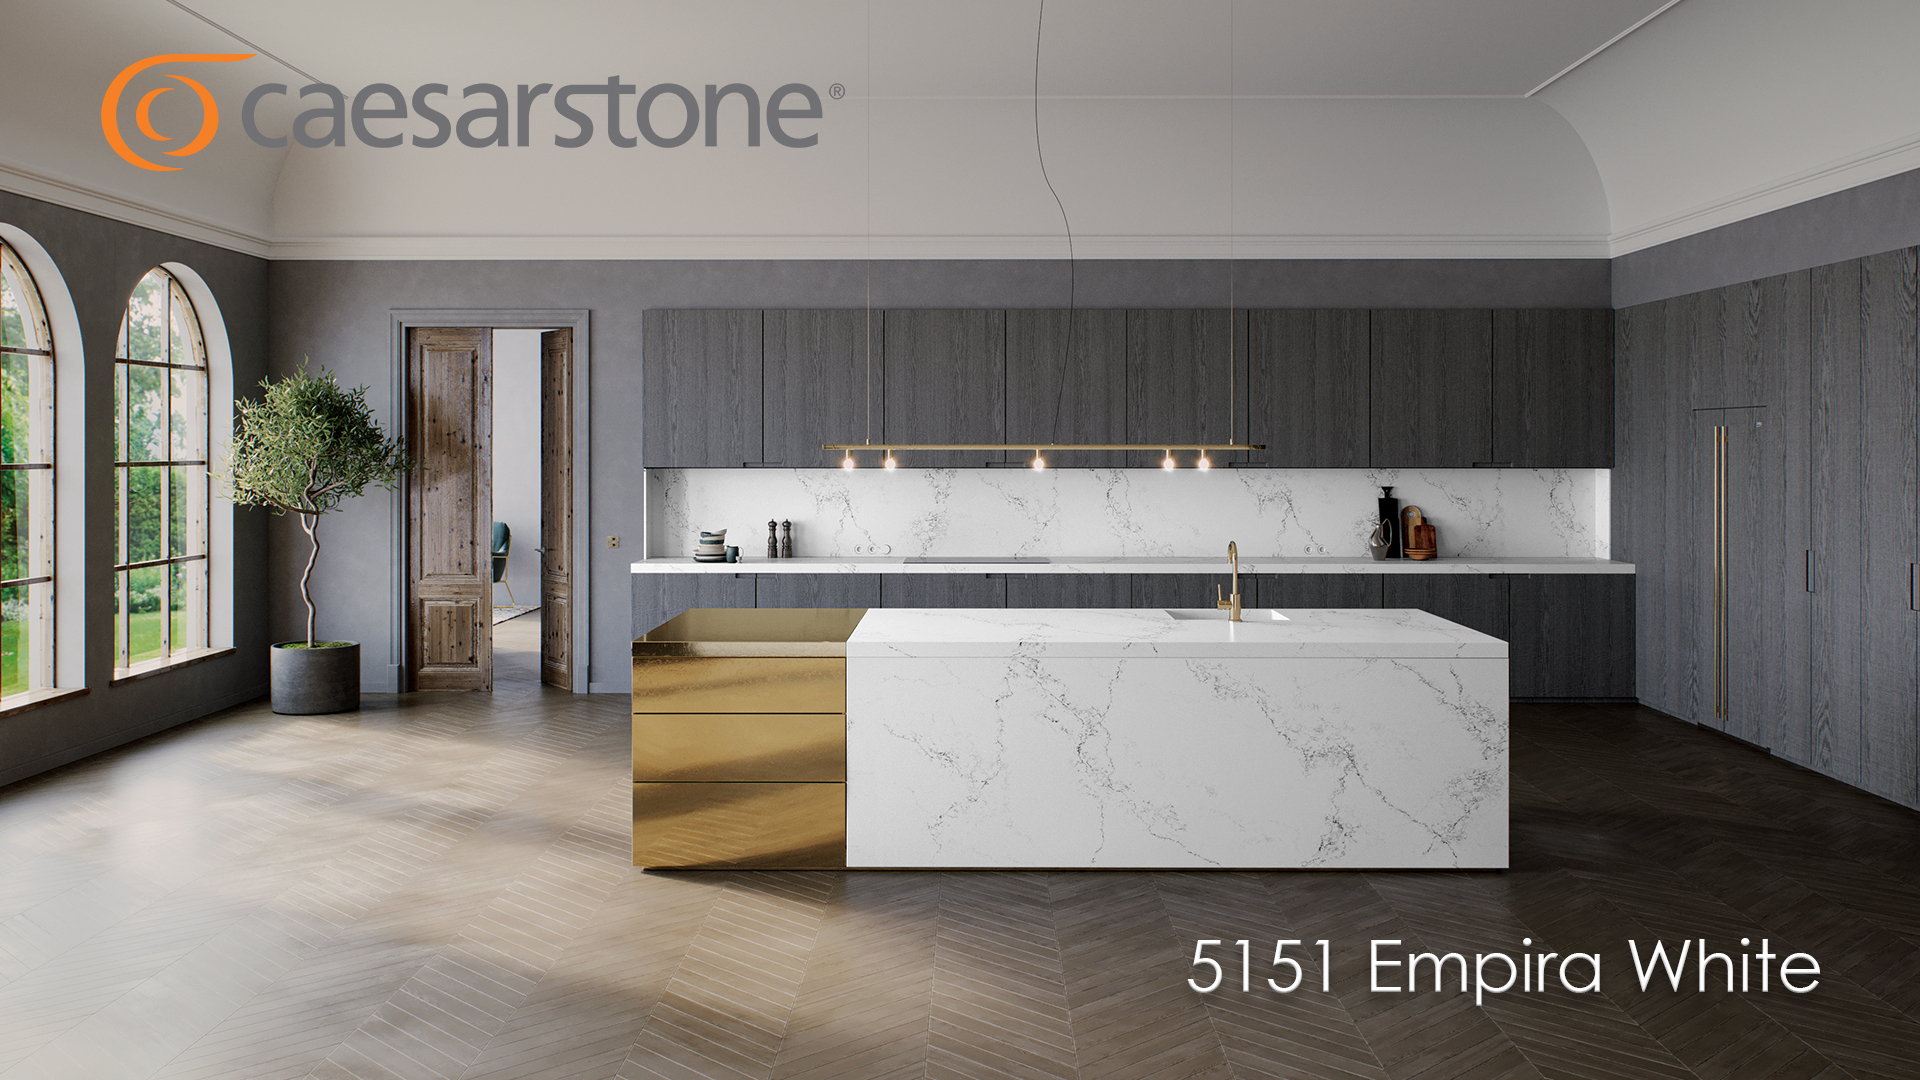 Caesarstone Quarzkomposit - Beispielbild - 5151 Empira White